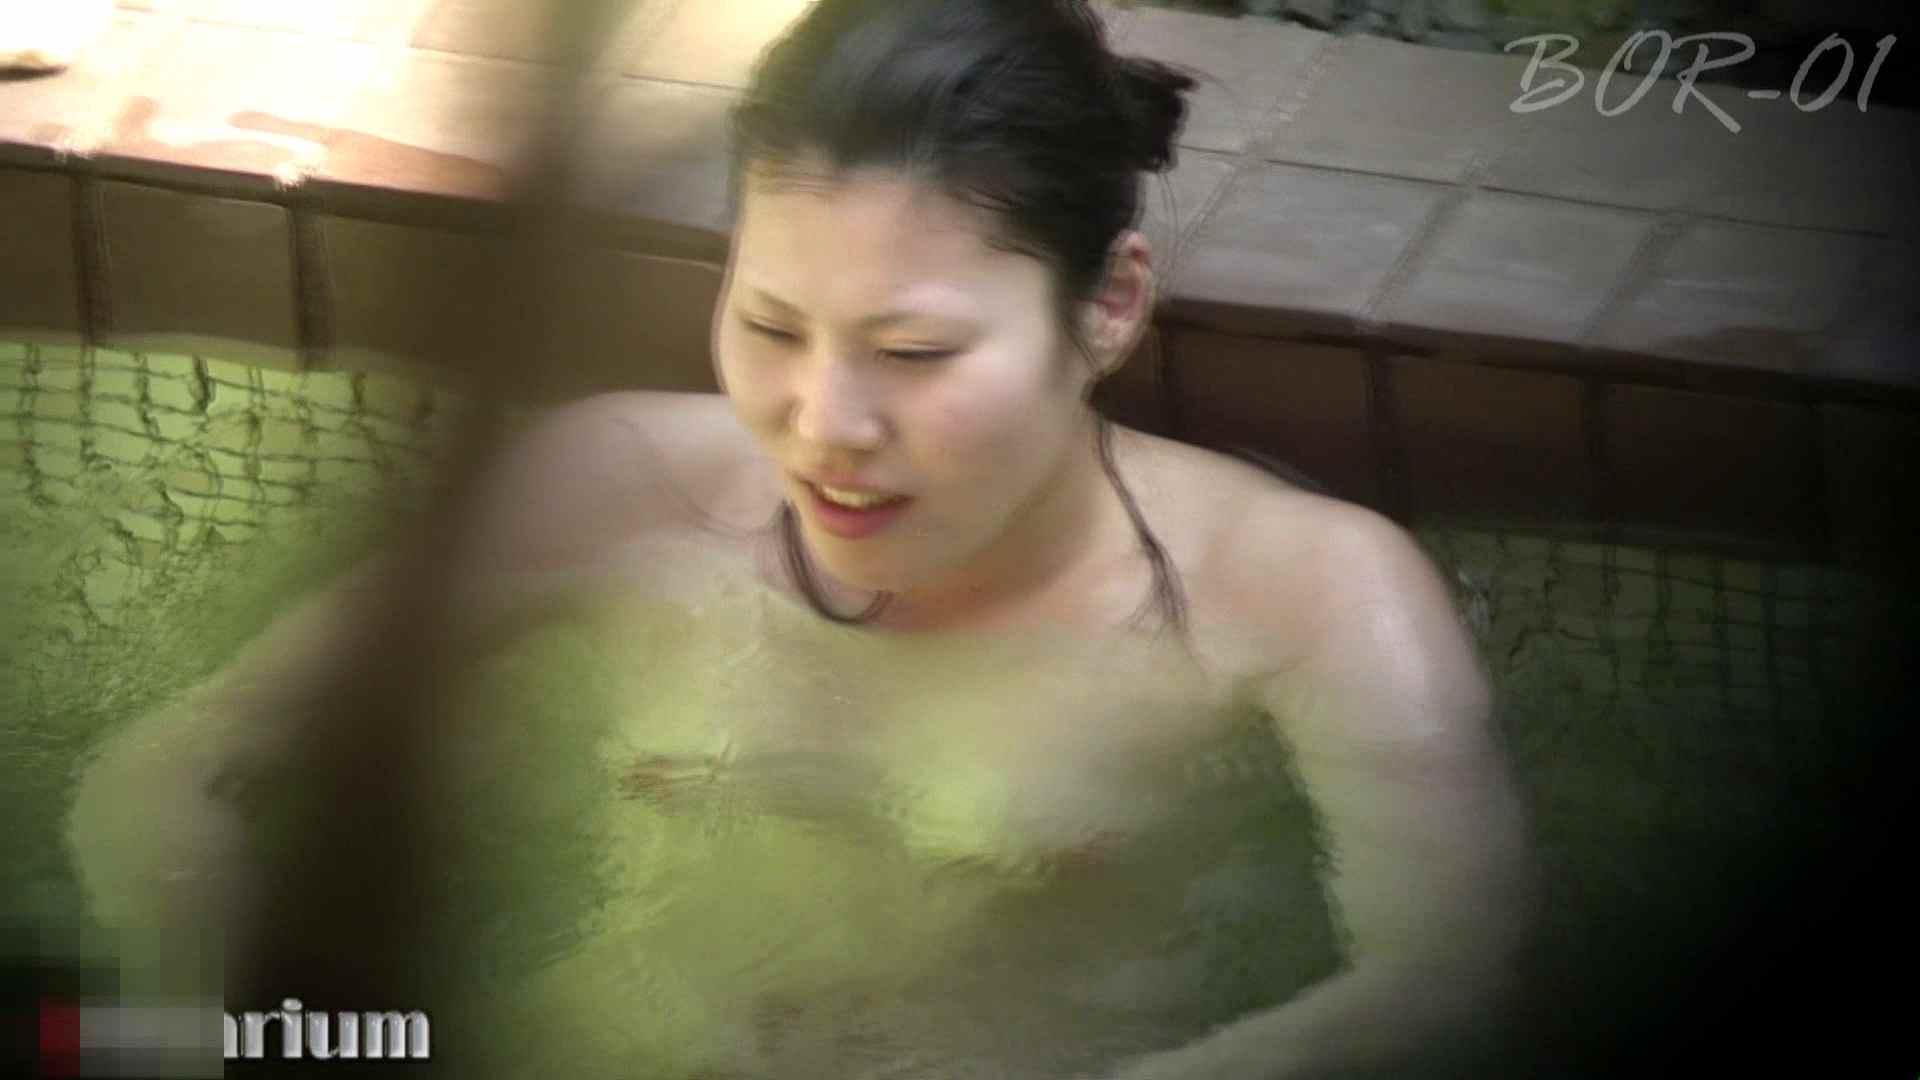 Aquaな露天風呂Vol.463 女体盗撮 覗きスケベ動画紹介 77連発 2